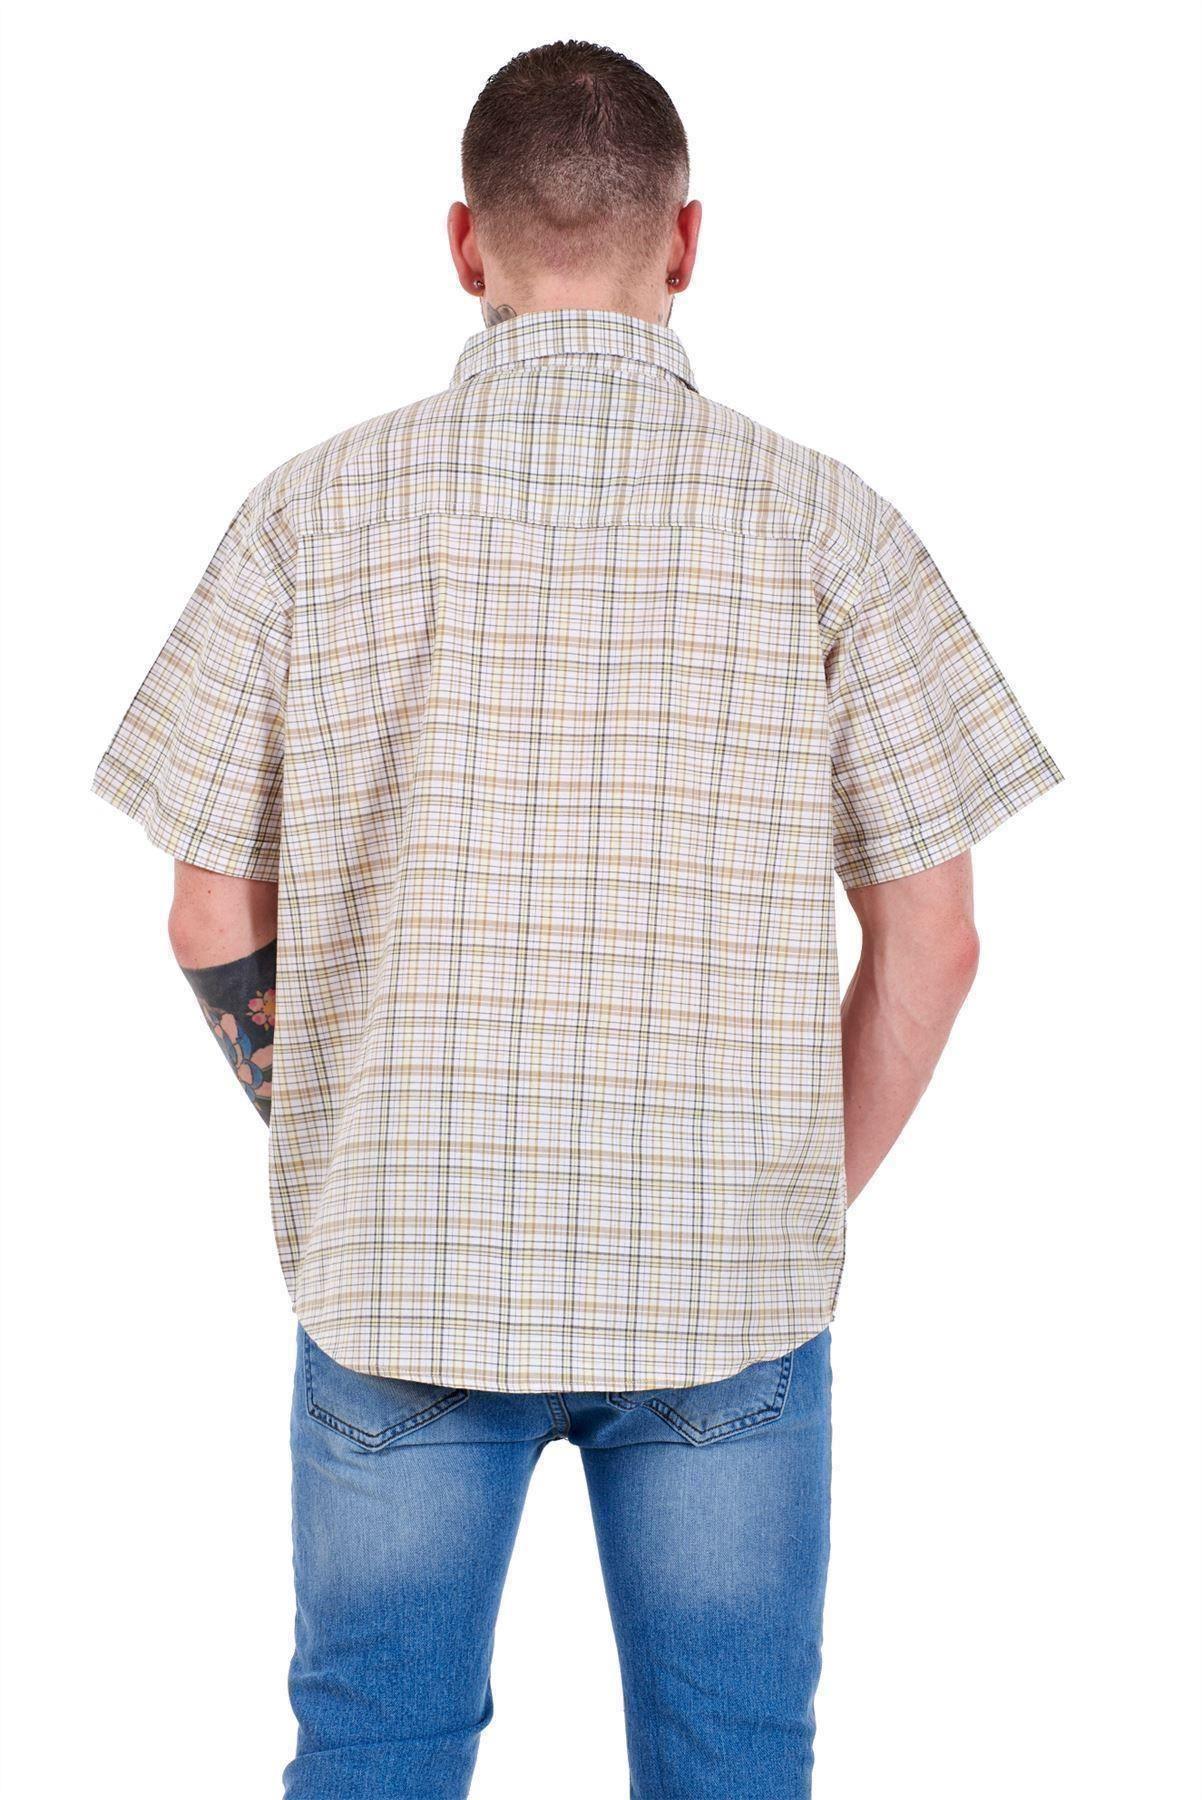 Mens-Regular-Big-Size-Shirts-Checked-Cotton-Blend-Casual-Short-Sleeve-M-to-5XL thumbnail 8